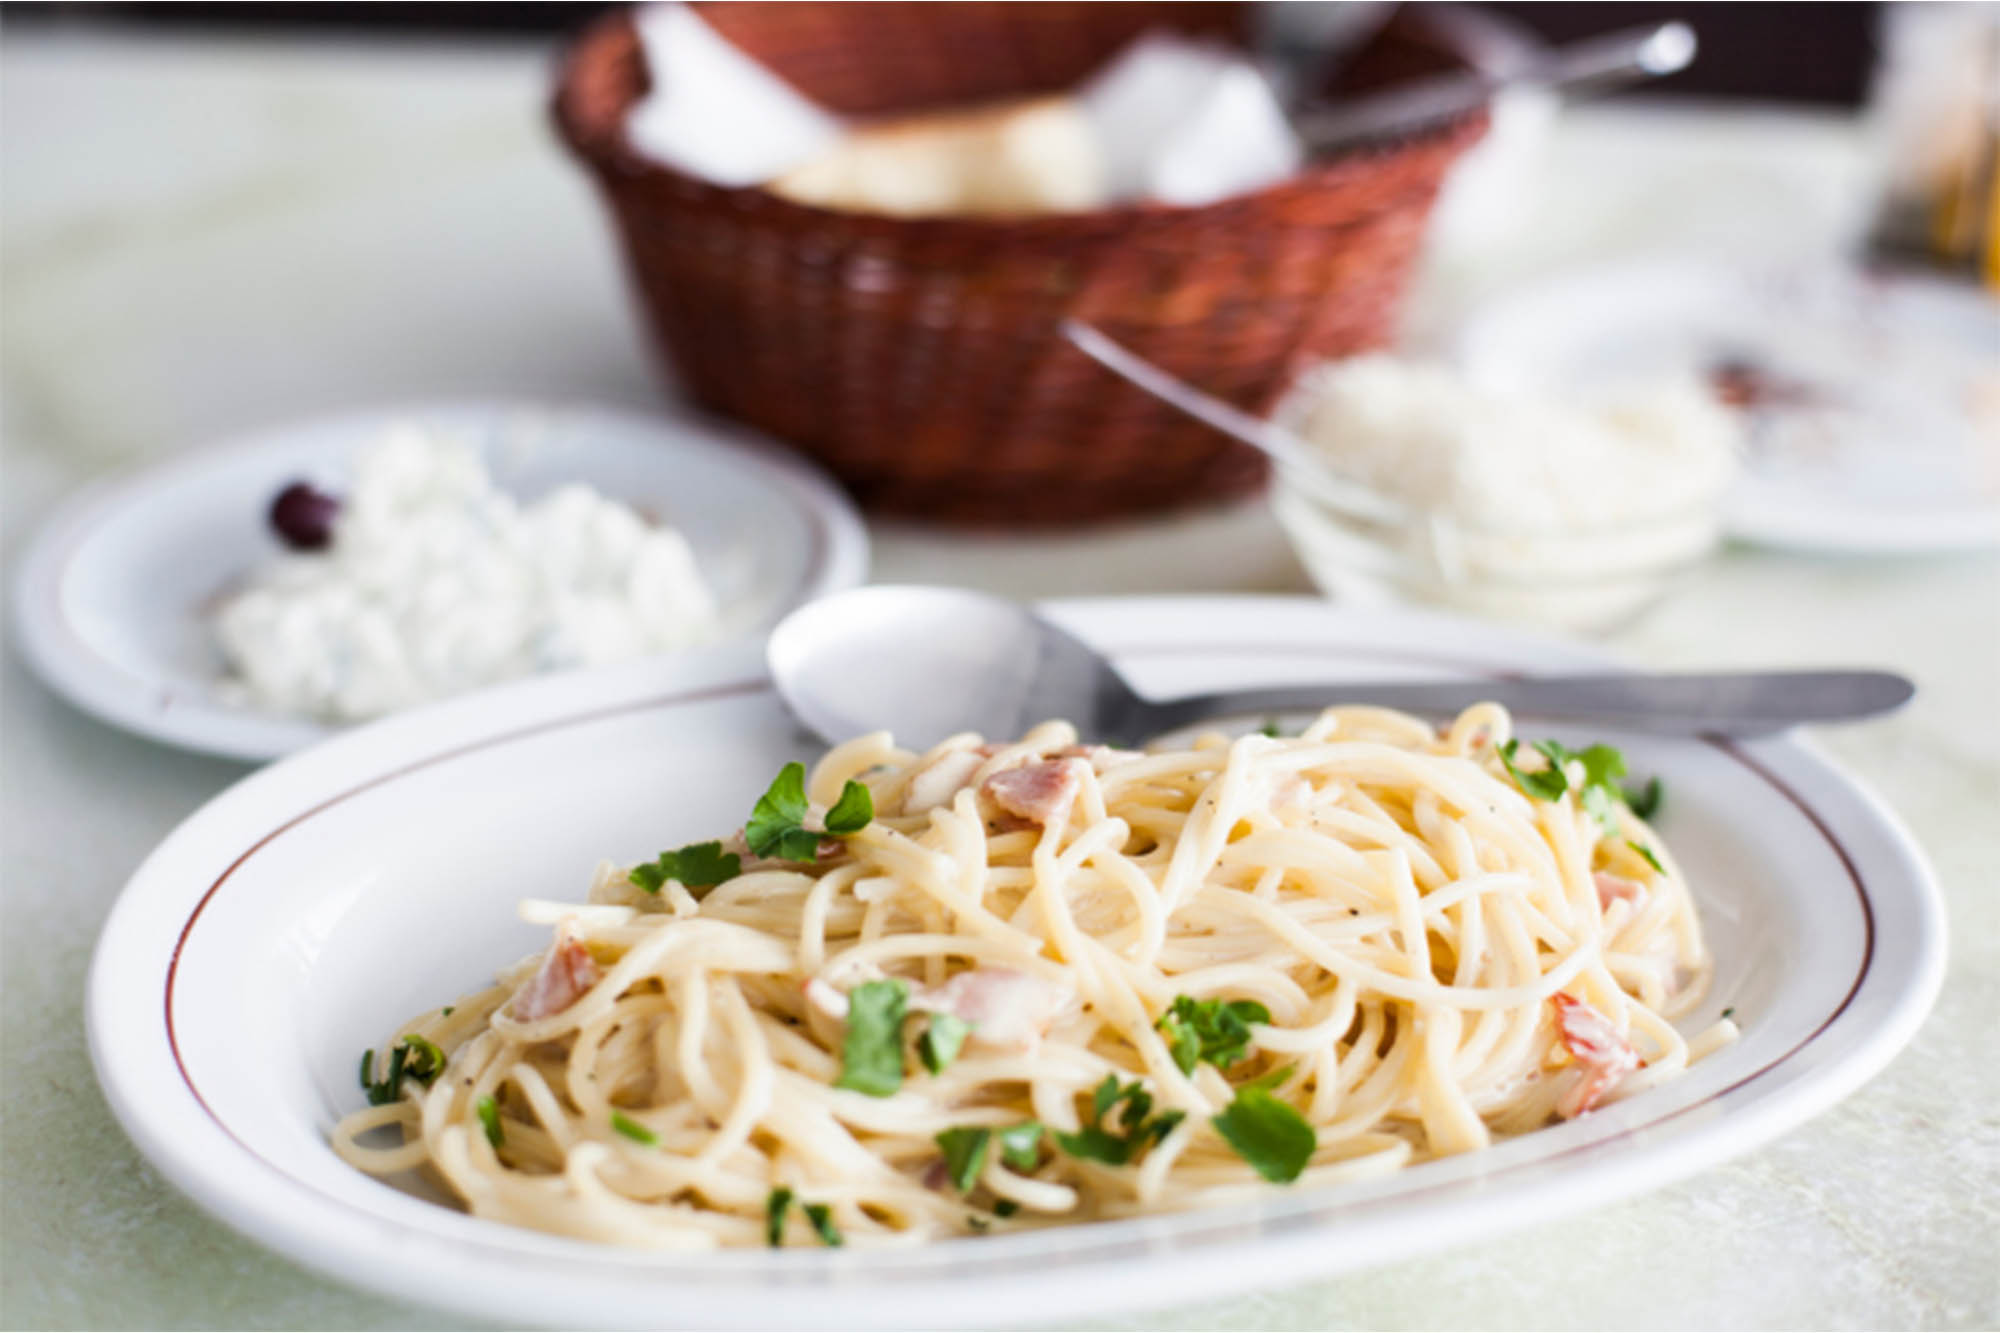 Pasta con salsa blanca